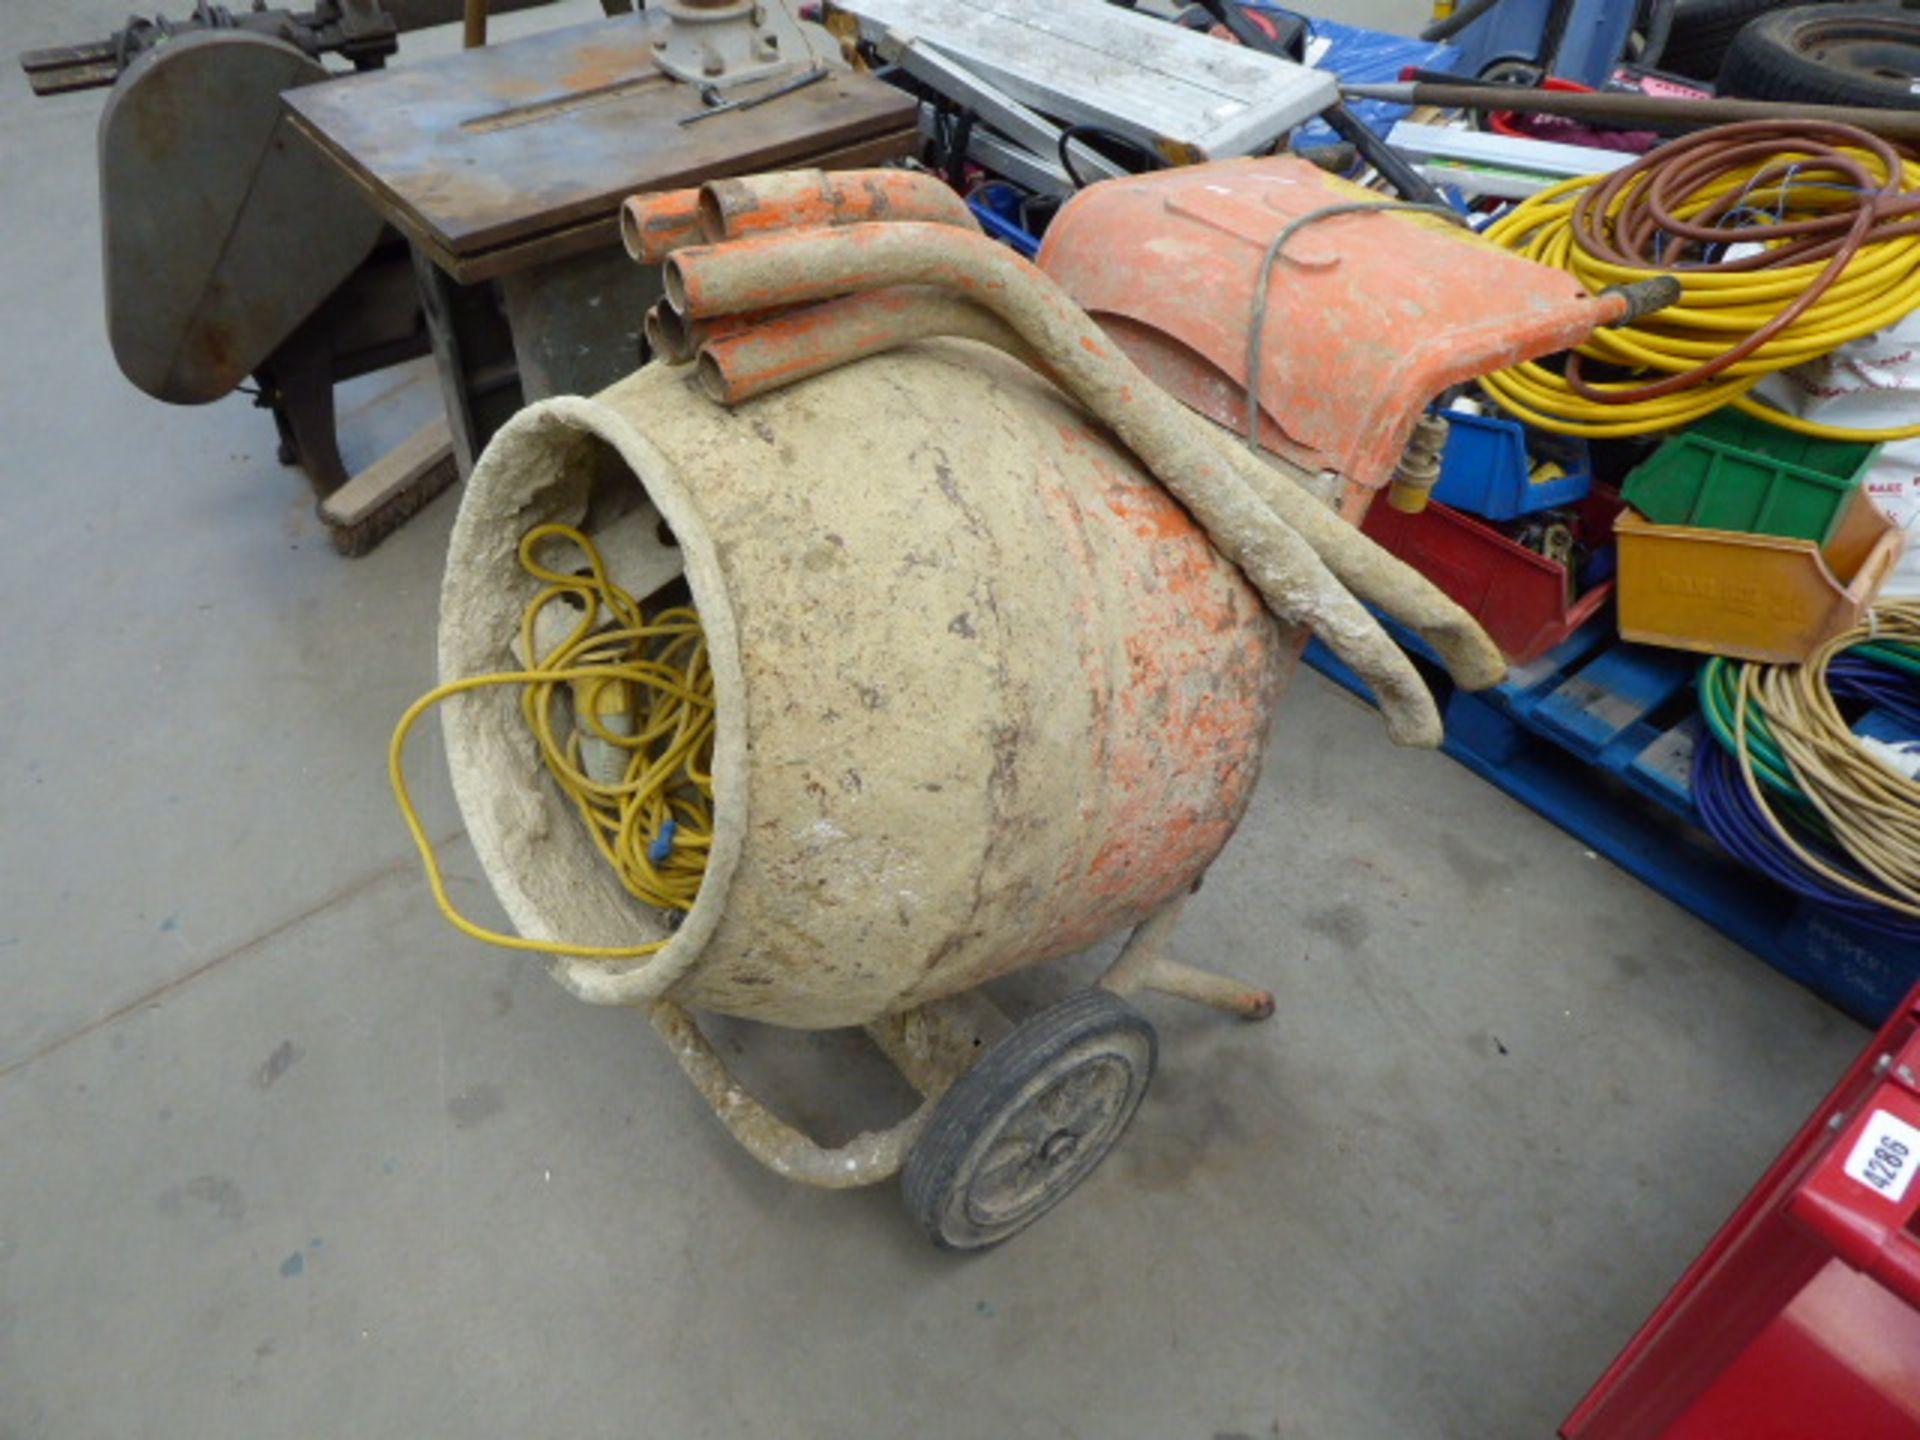 Lot 4287 - Belle electric mini mixer